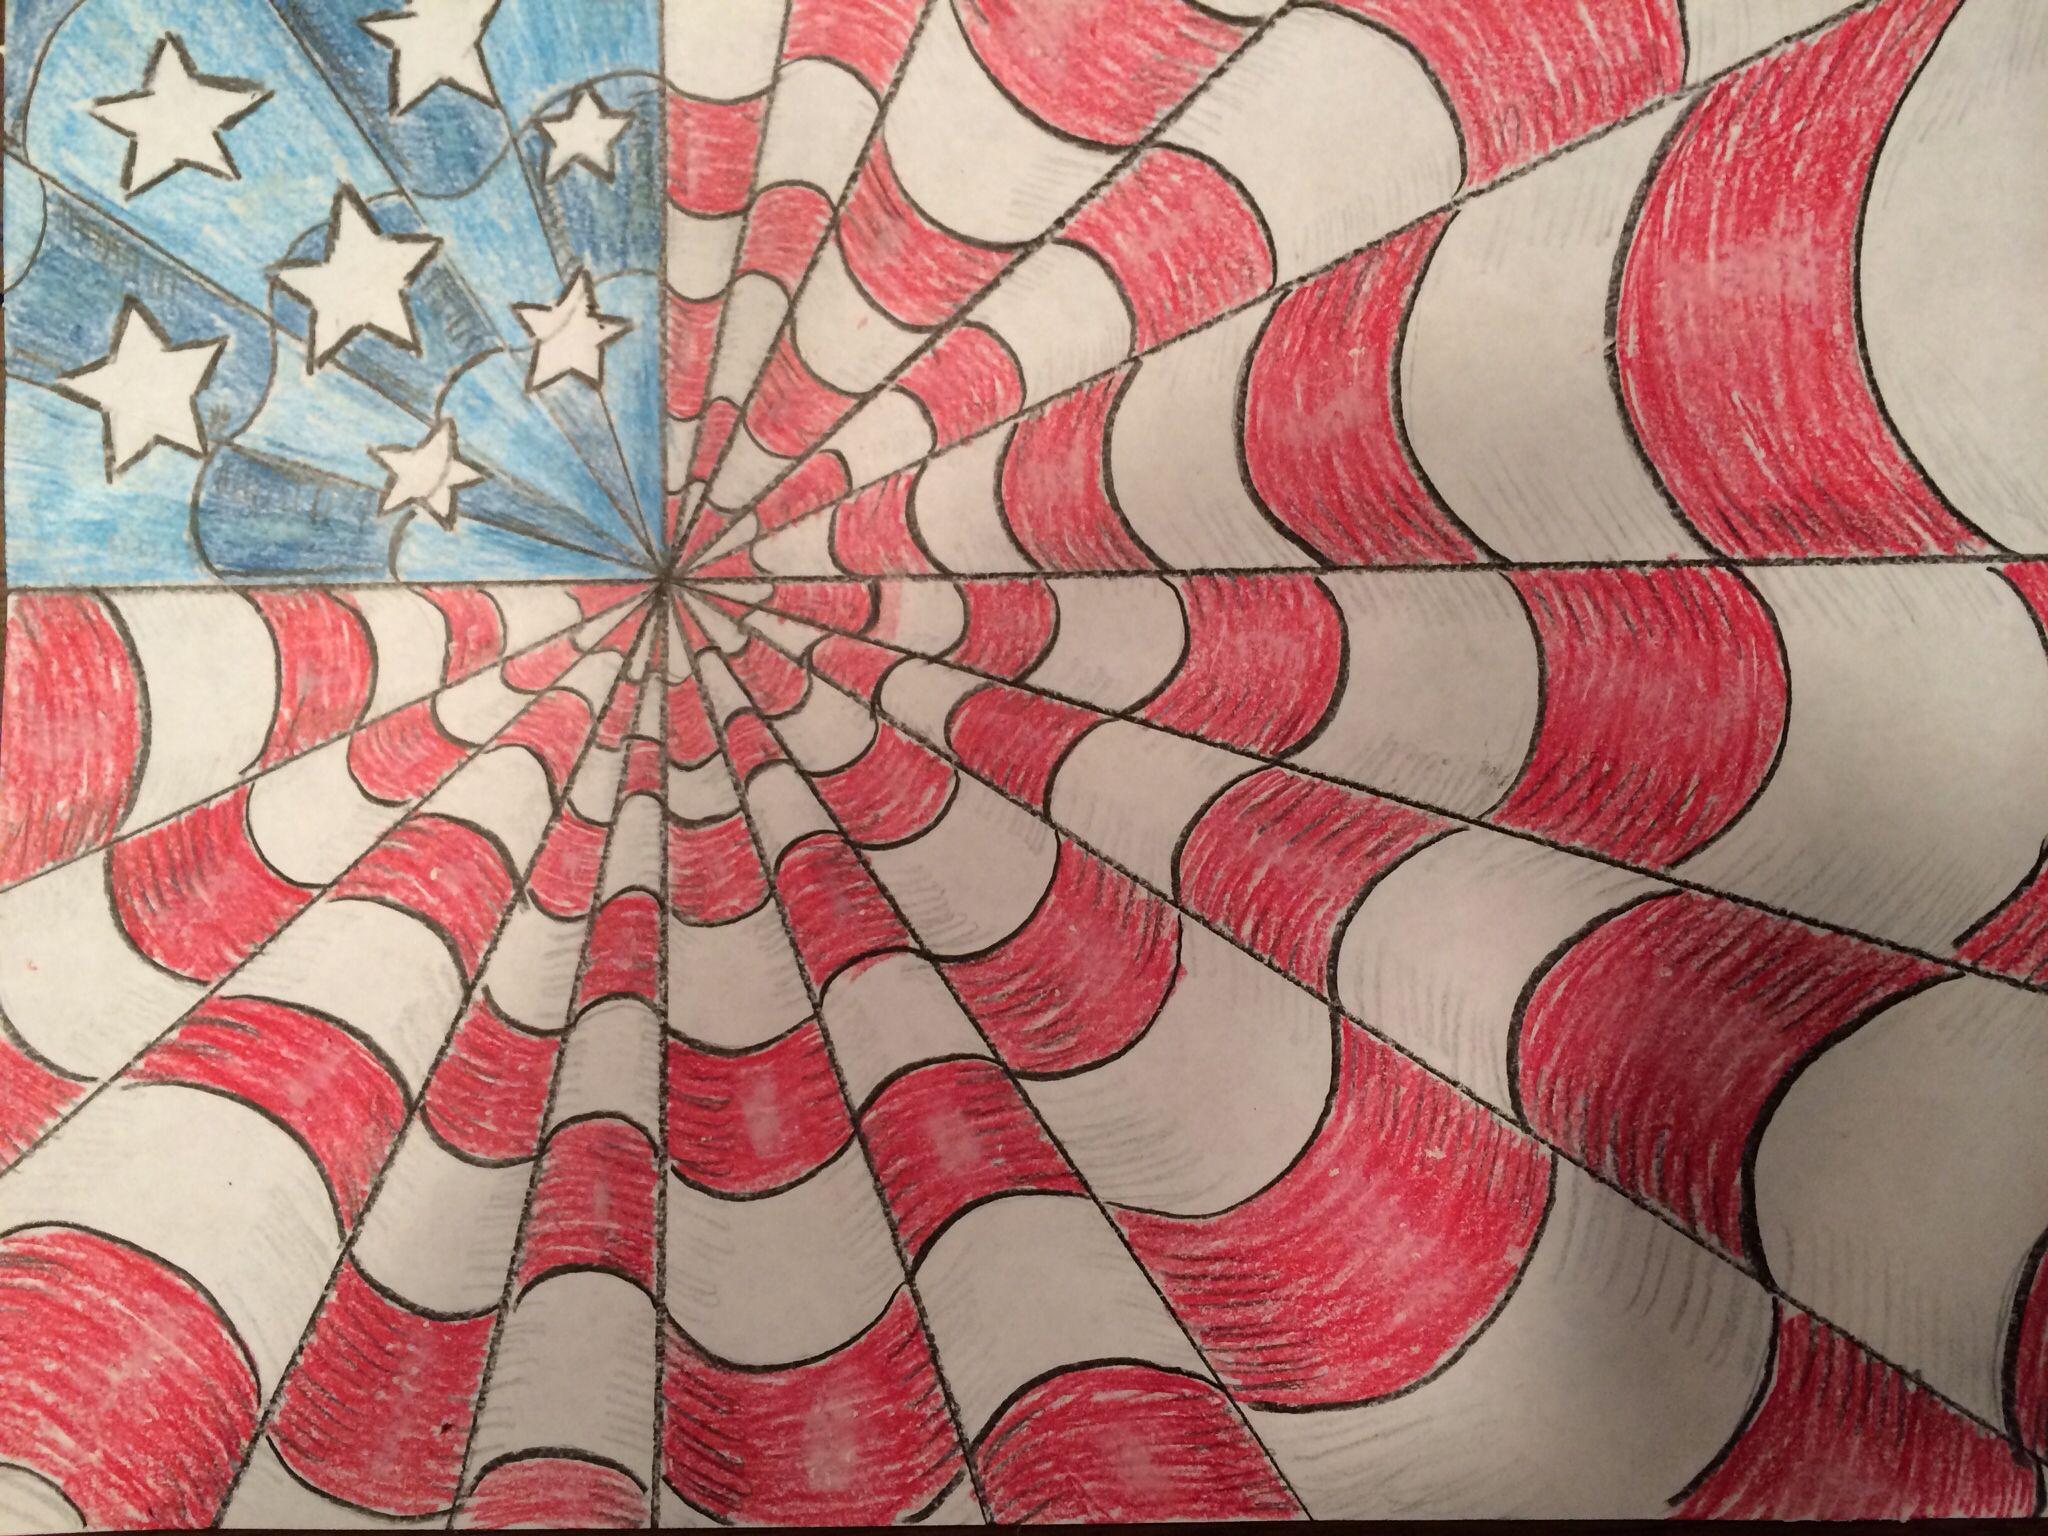 Happy 4th of July art project. #veteransdayartprojects